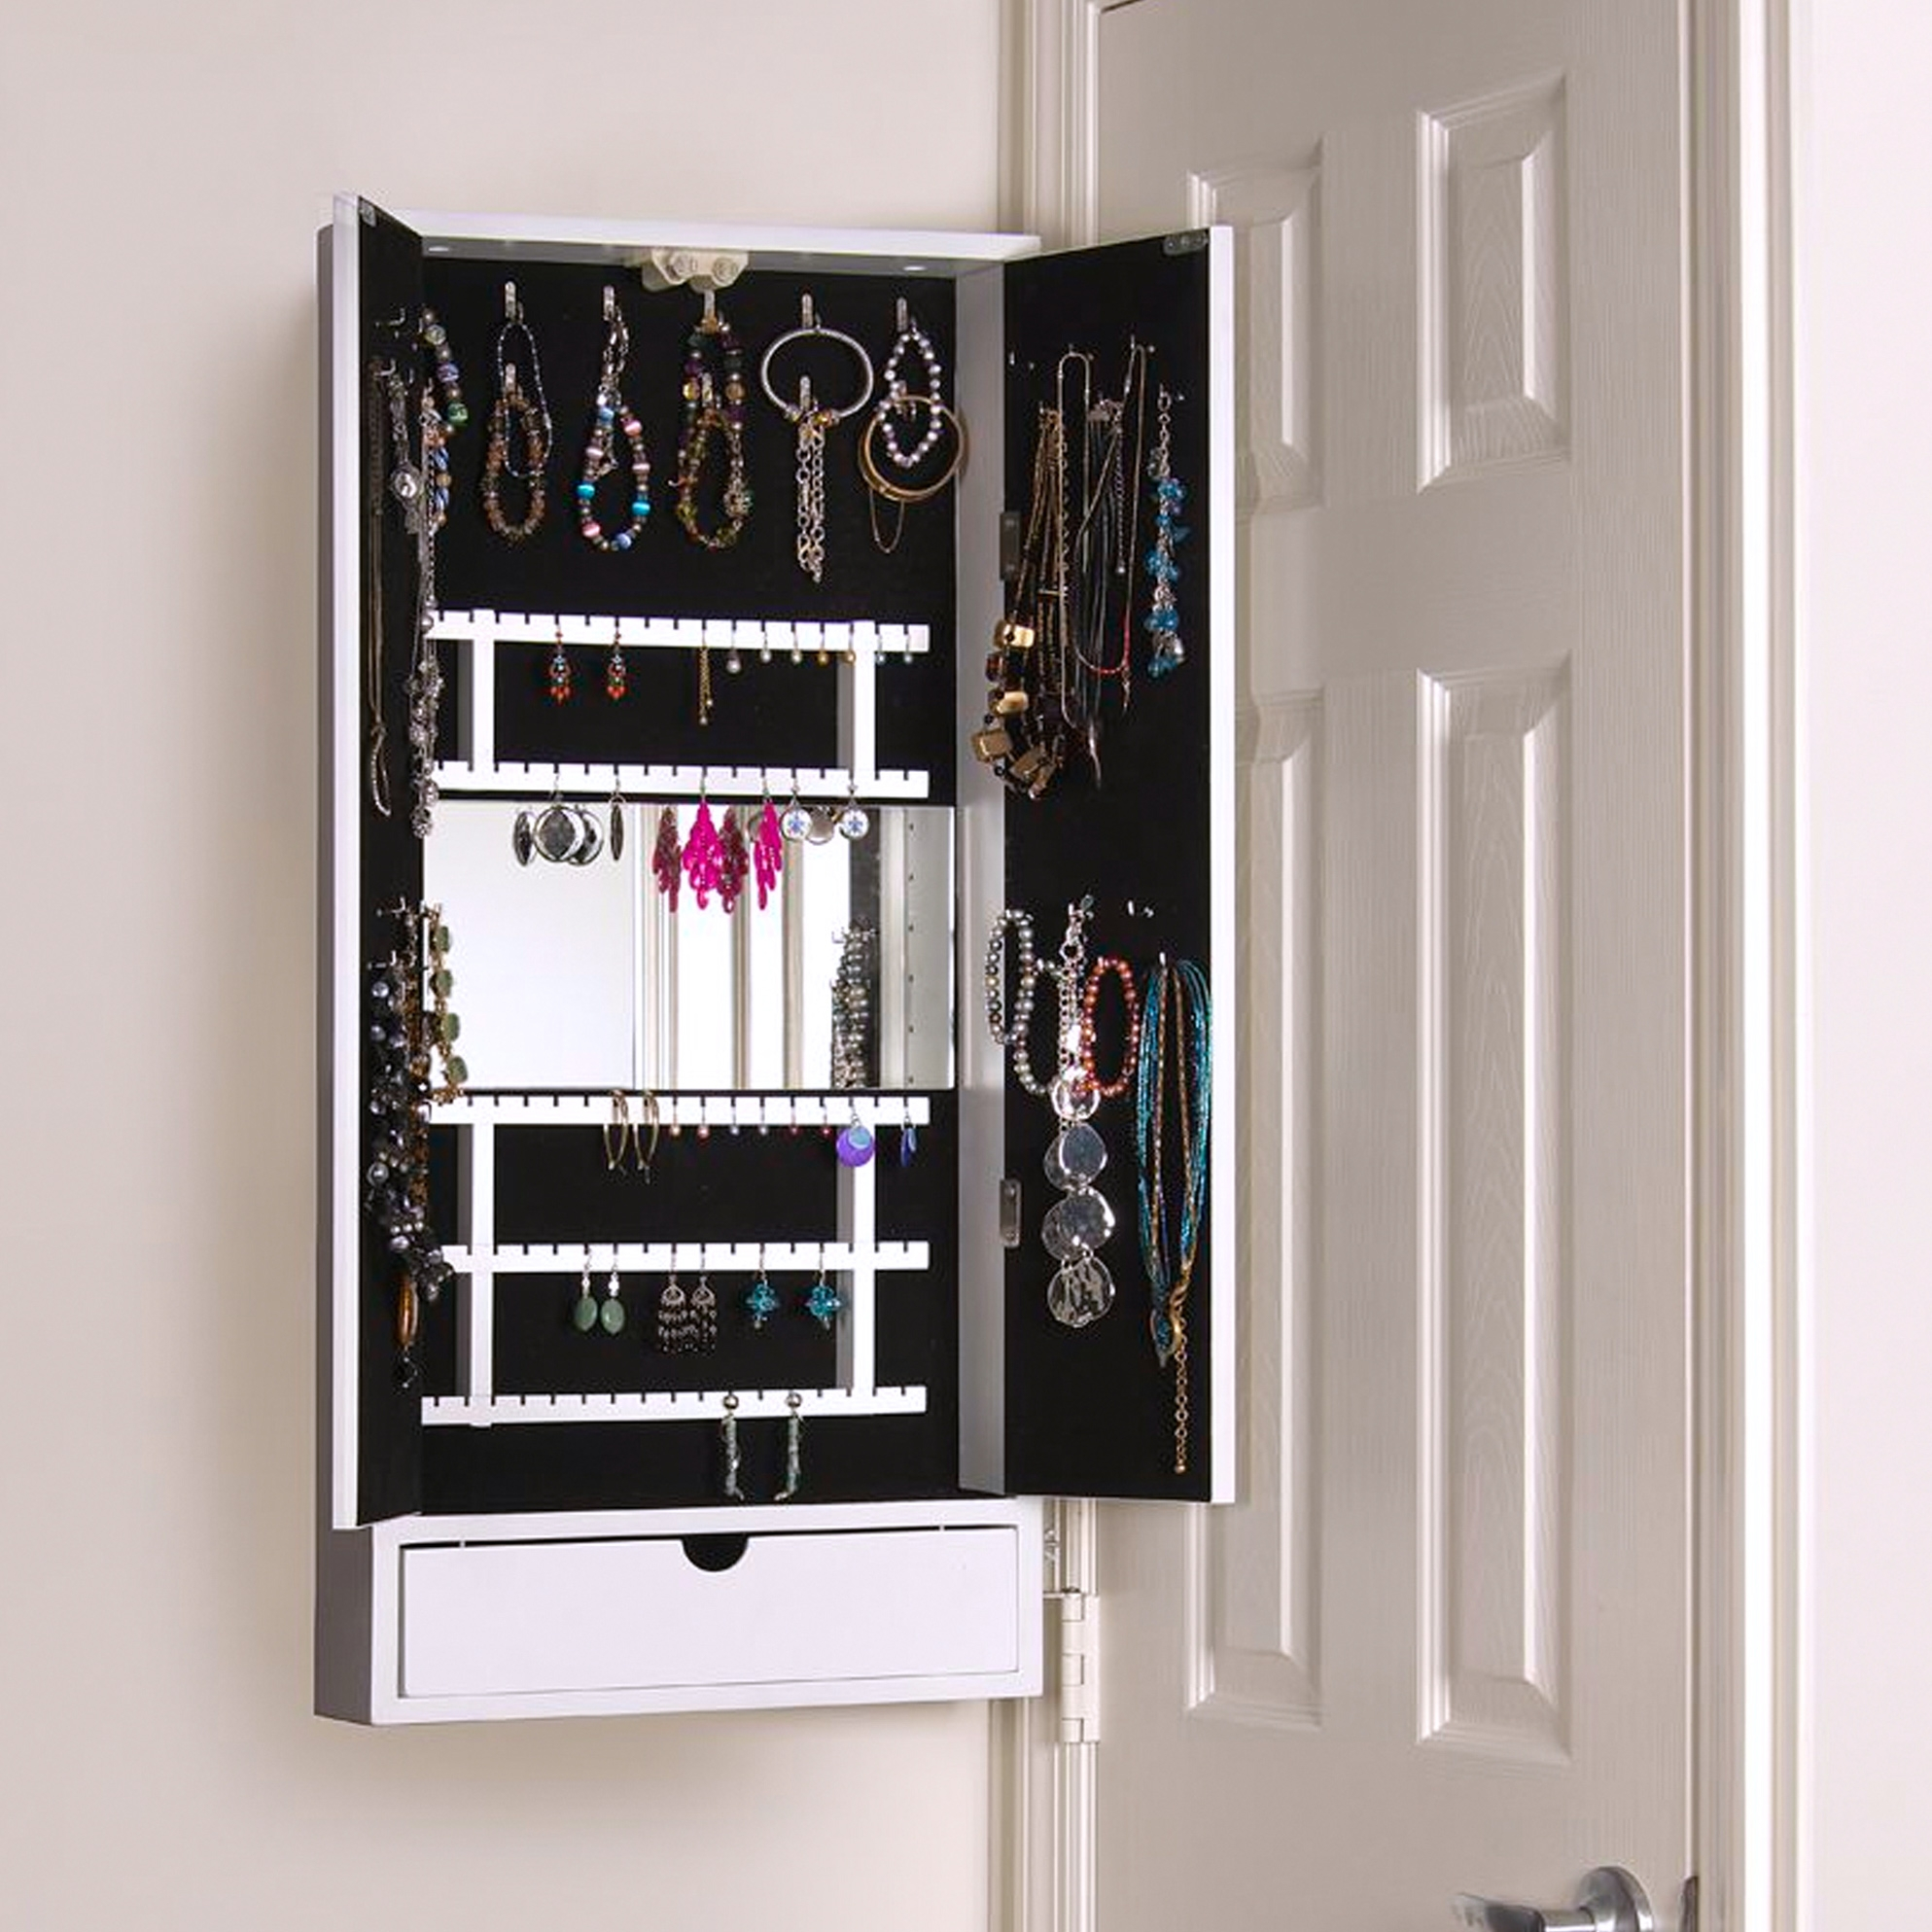 Permalink to Wall Mount Jewelry Storage Mirror